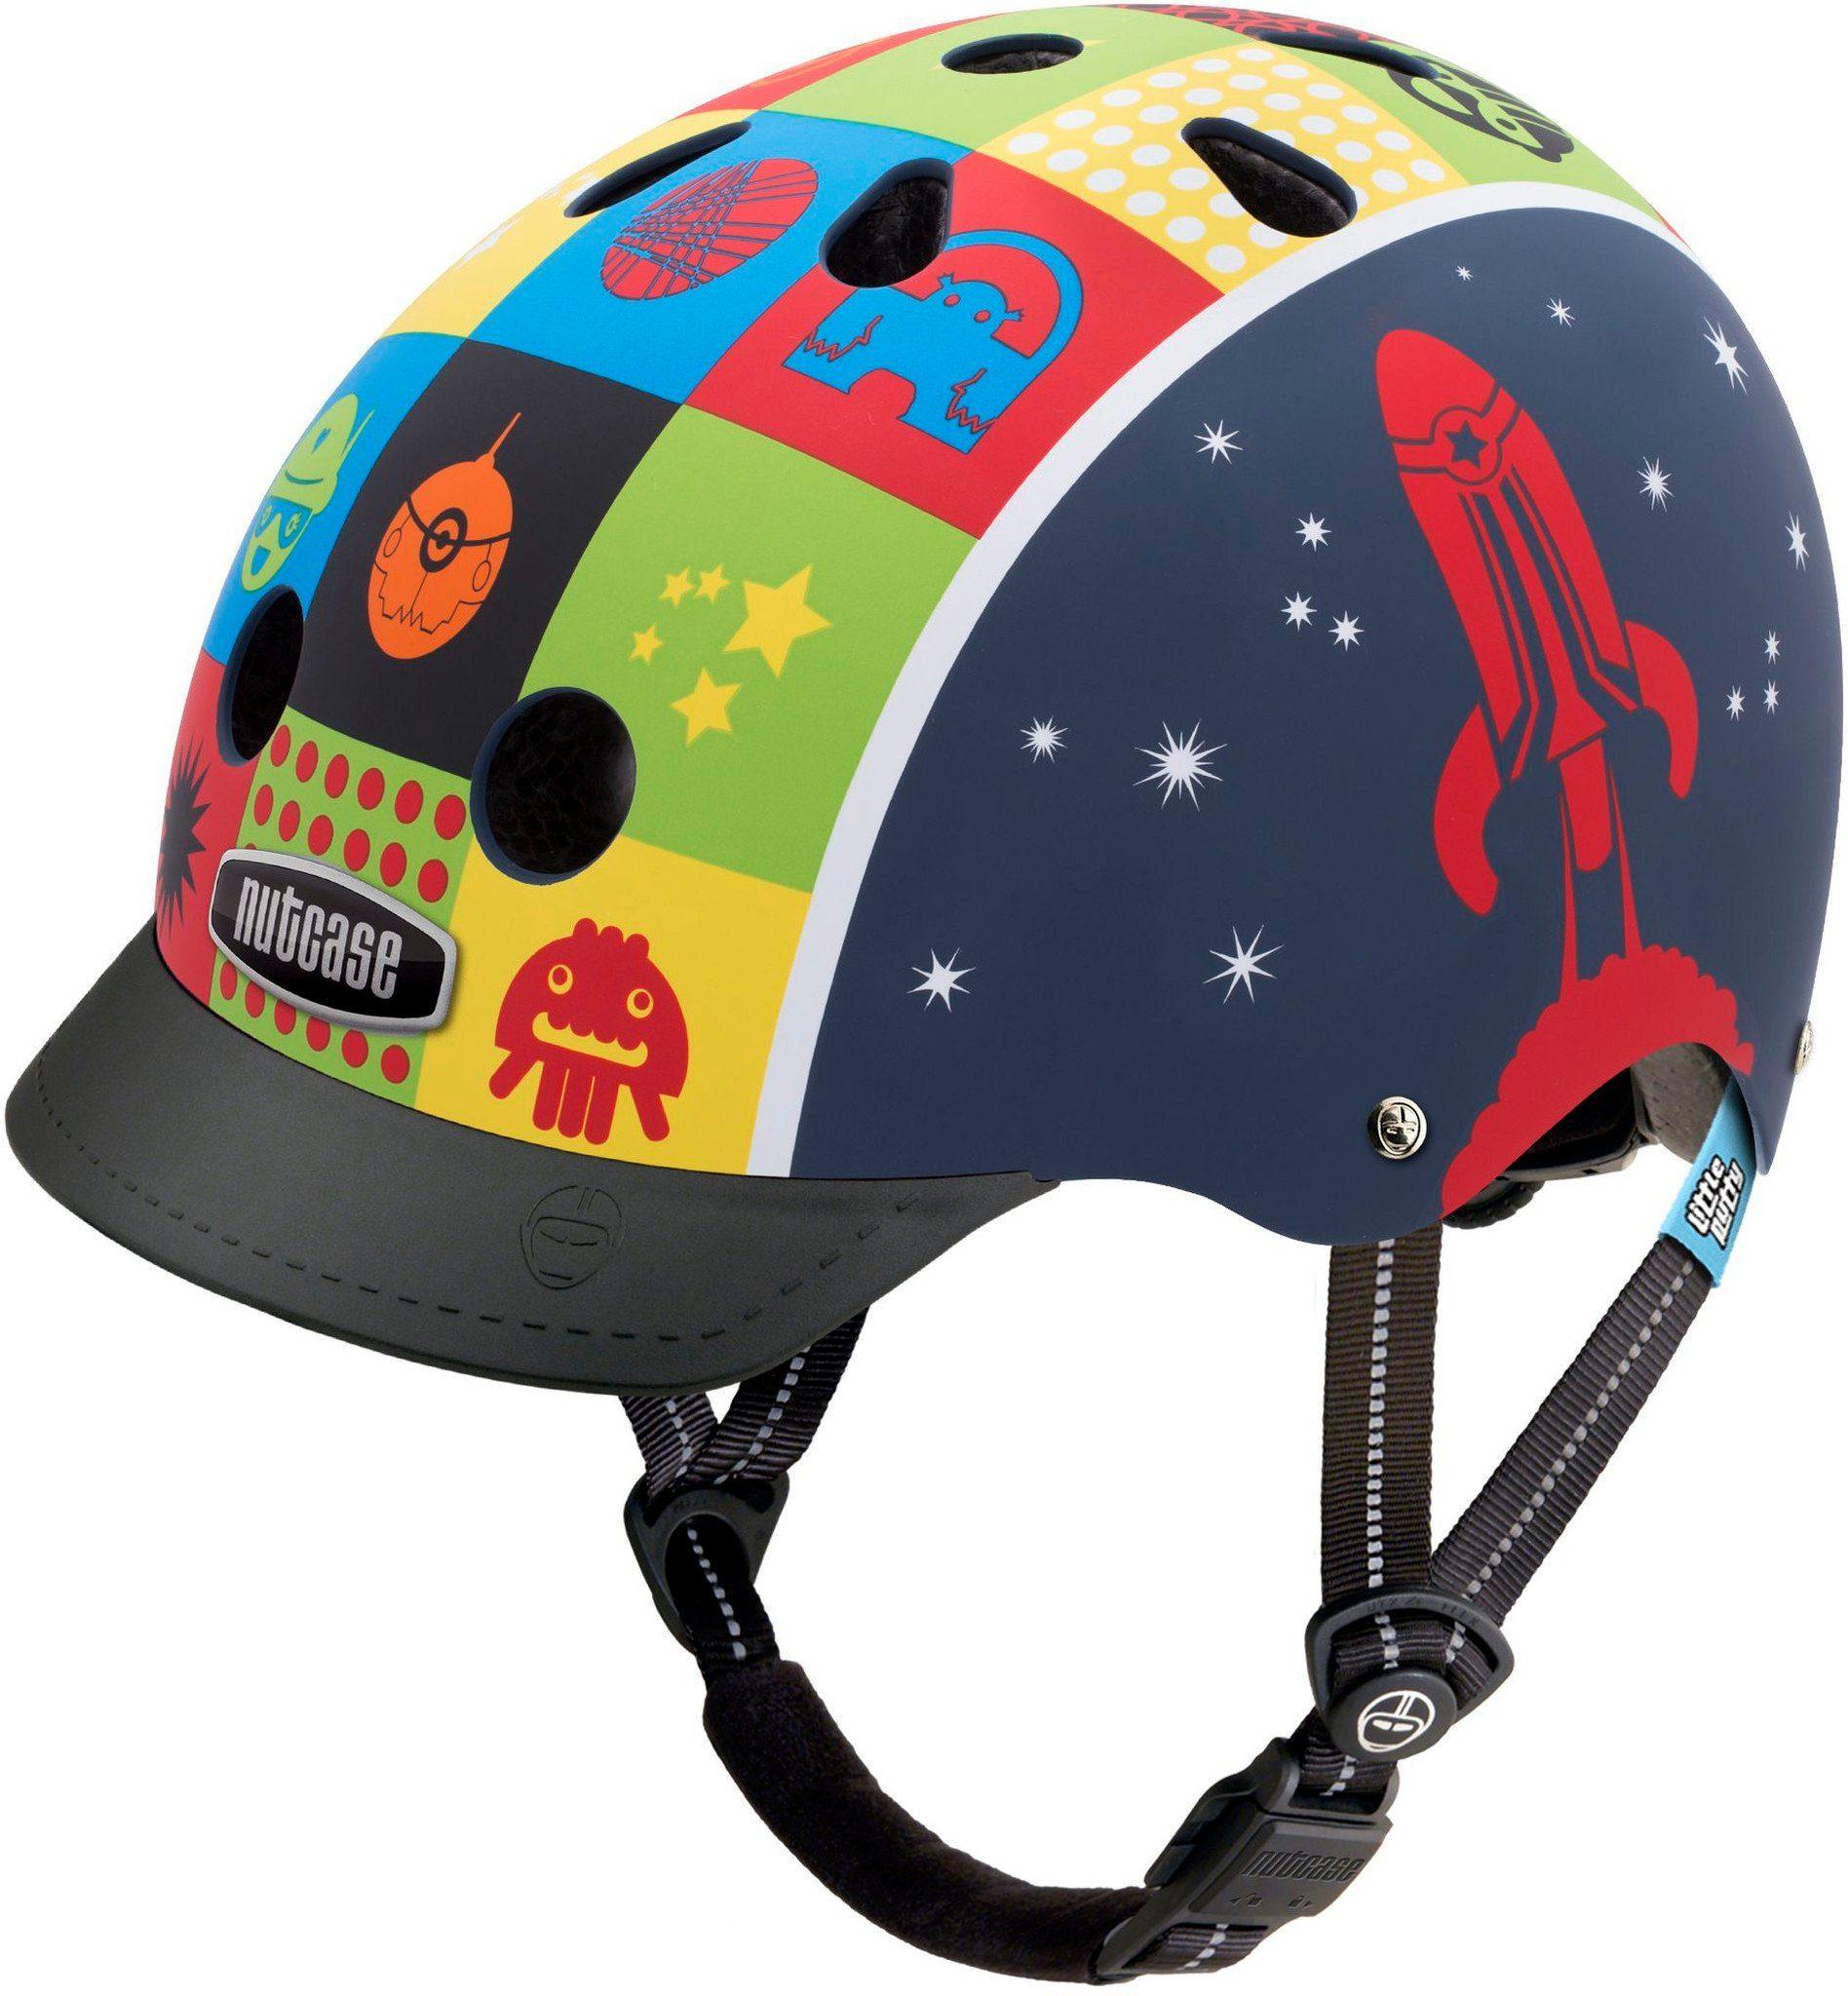 Nutcase Fahrradhelm »Little Nutty Street Helmet Kids«